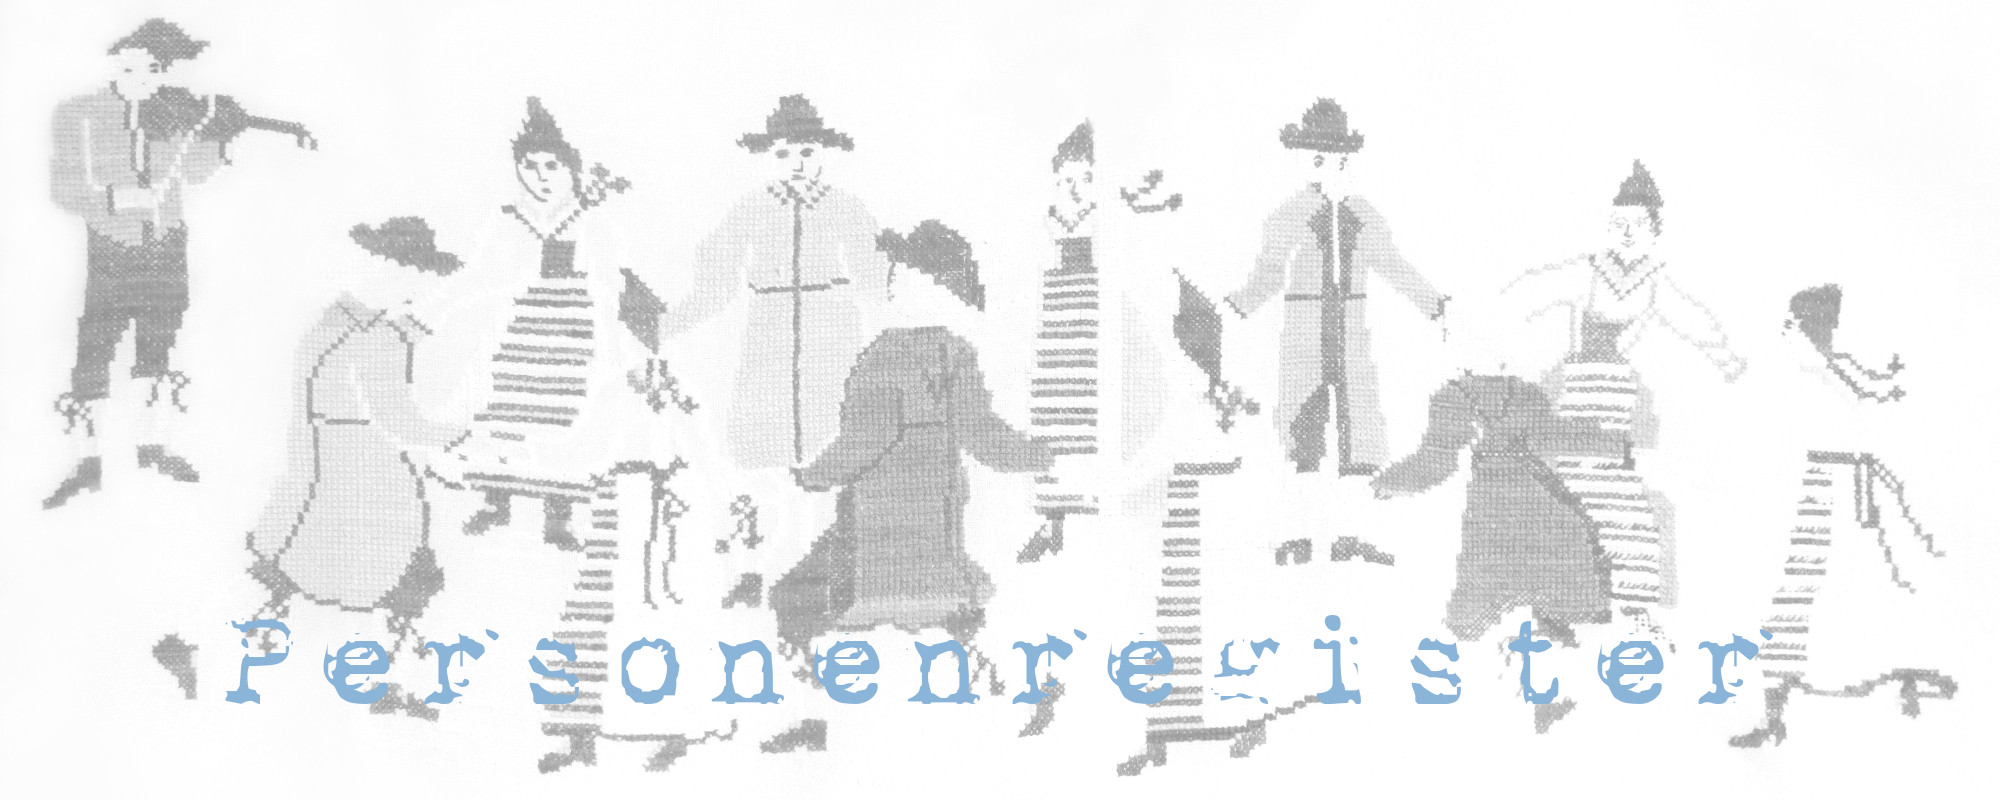 Gerold-Tietz-Glossare-Personen-Romane-Boehmen